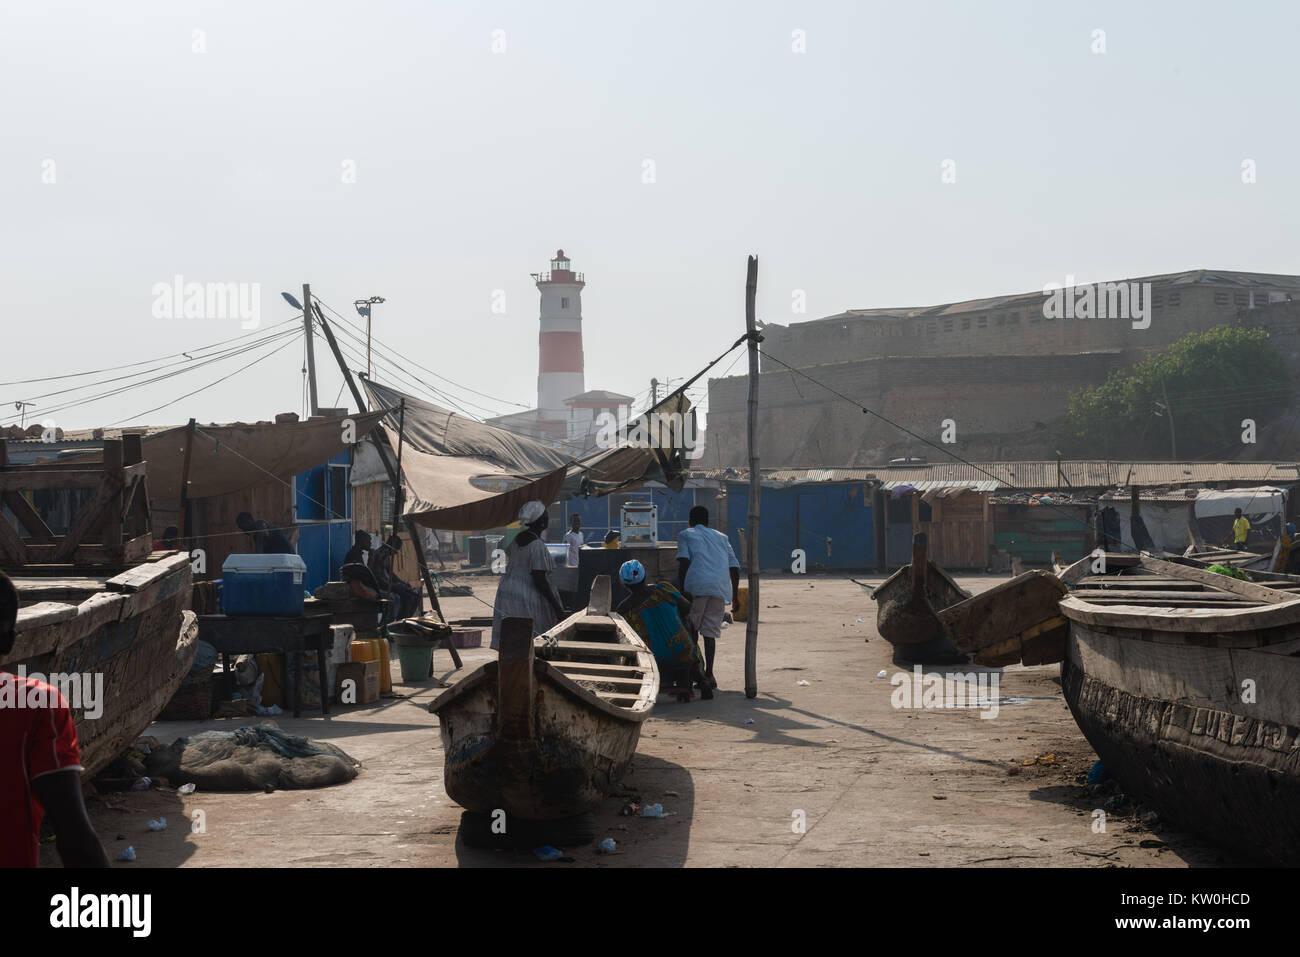 Jamestown lighthouse, 'Christ the King of Kings School' in Jamestown Fishing Village, Jamestown, Accra, - Stock Image